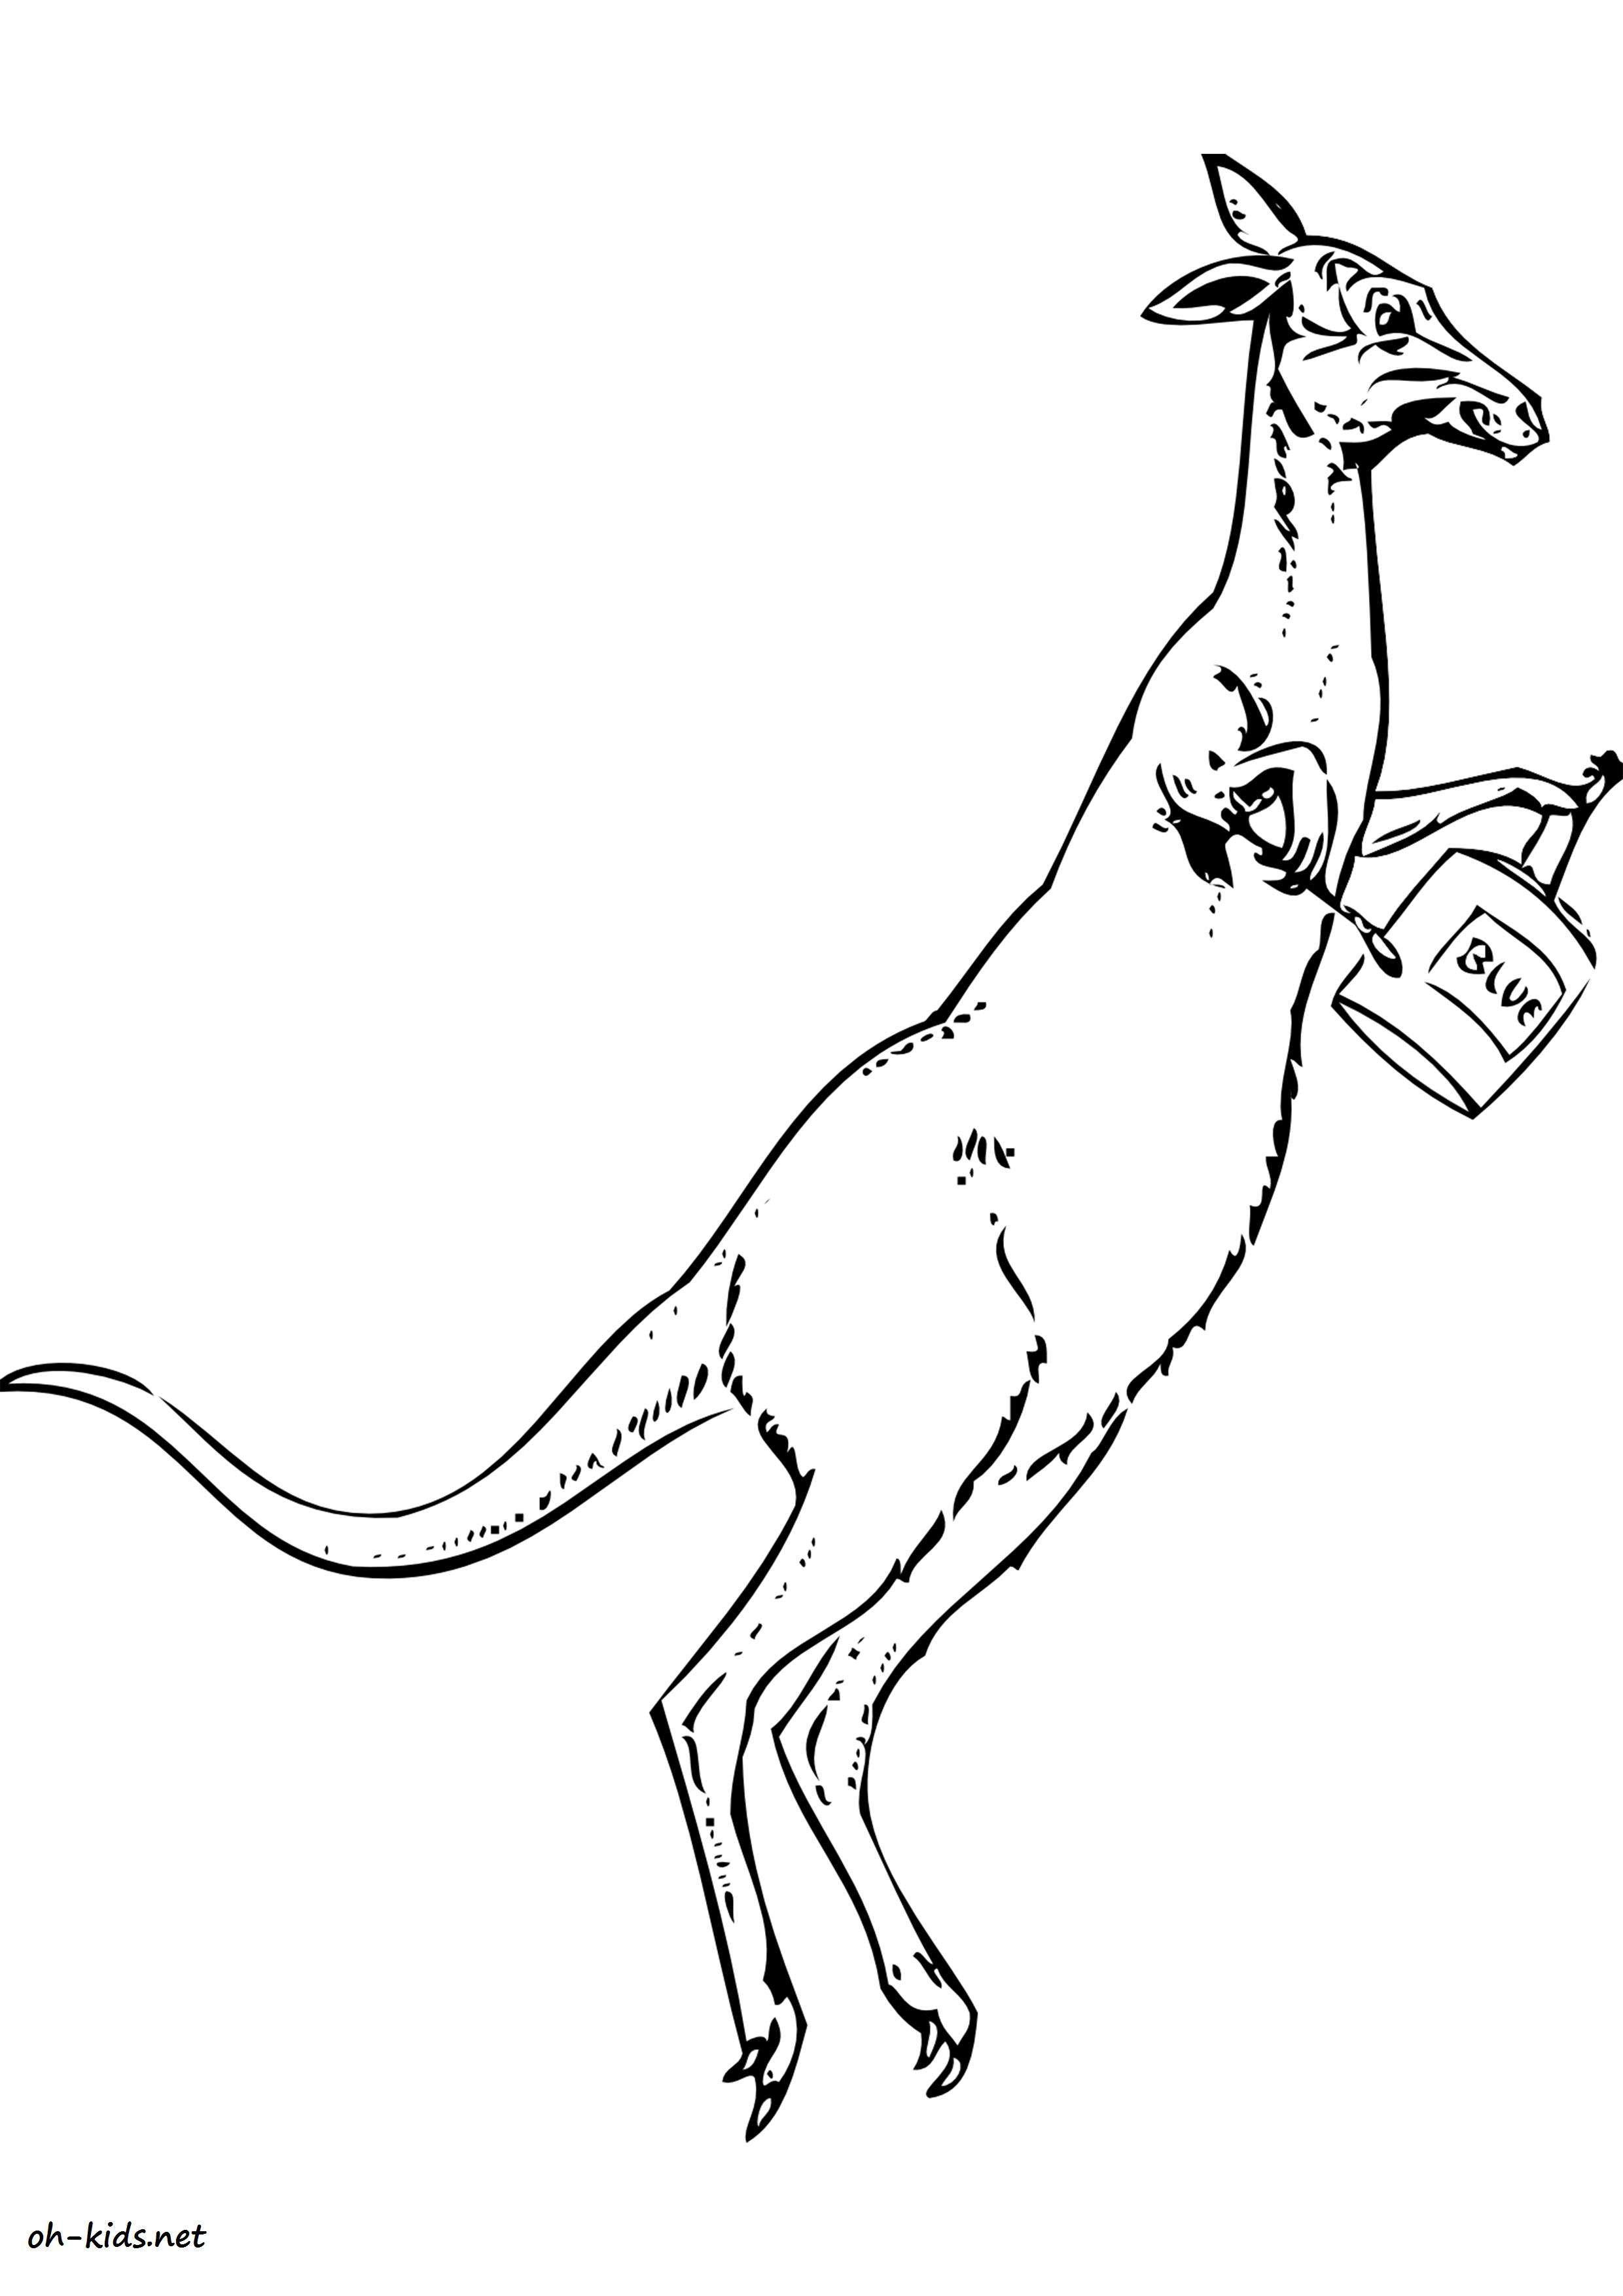 dessin gratuit de kangourou a imprimer - Dessin #1631